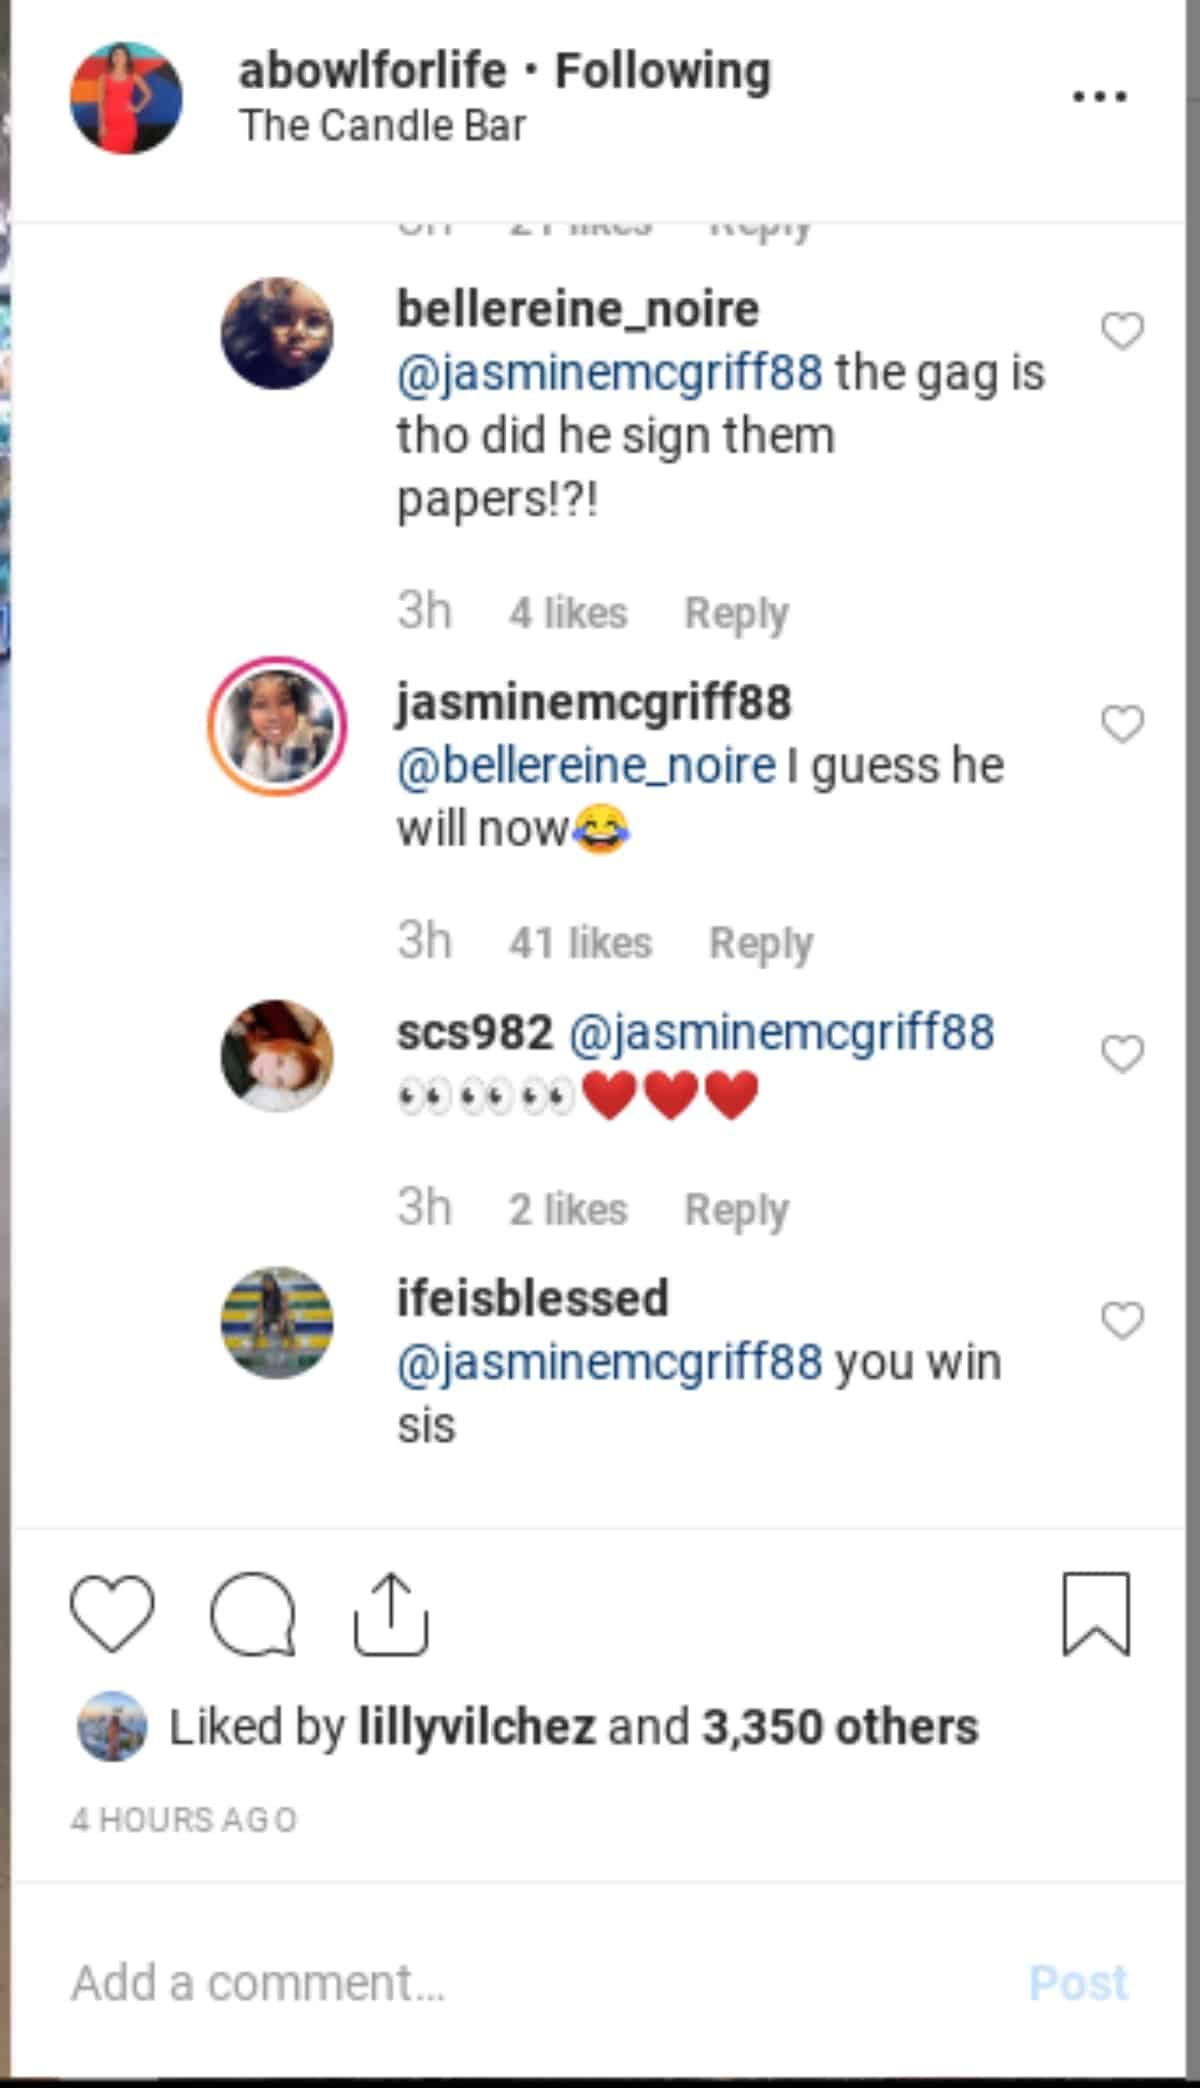 Jasmine's Instagram comments